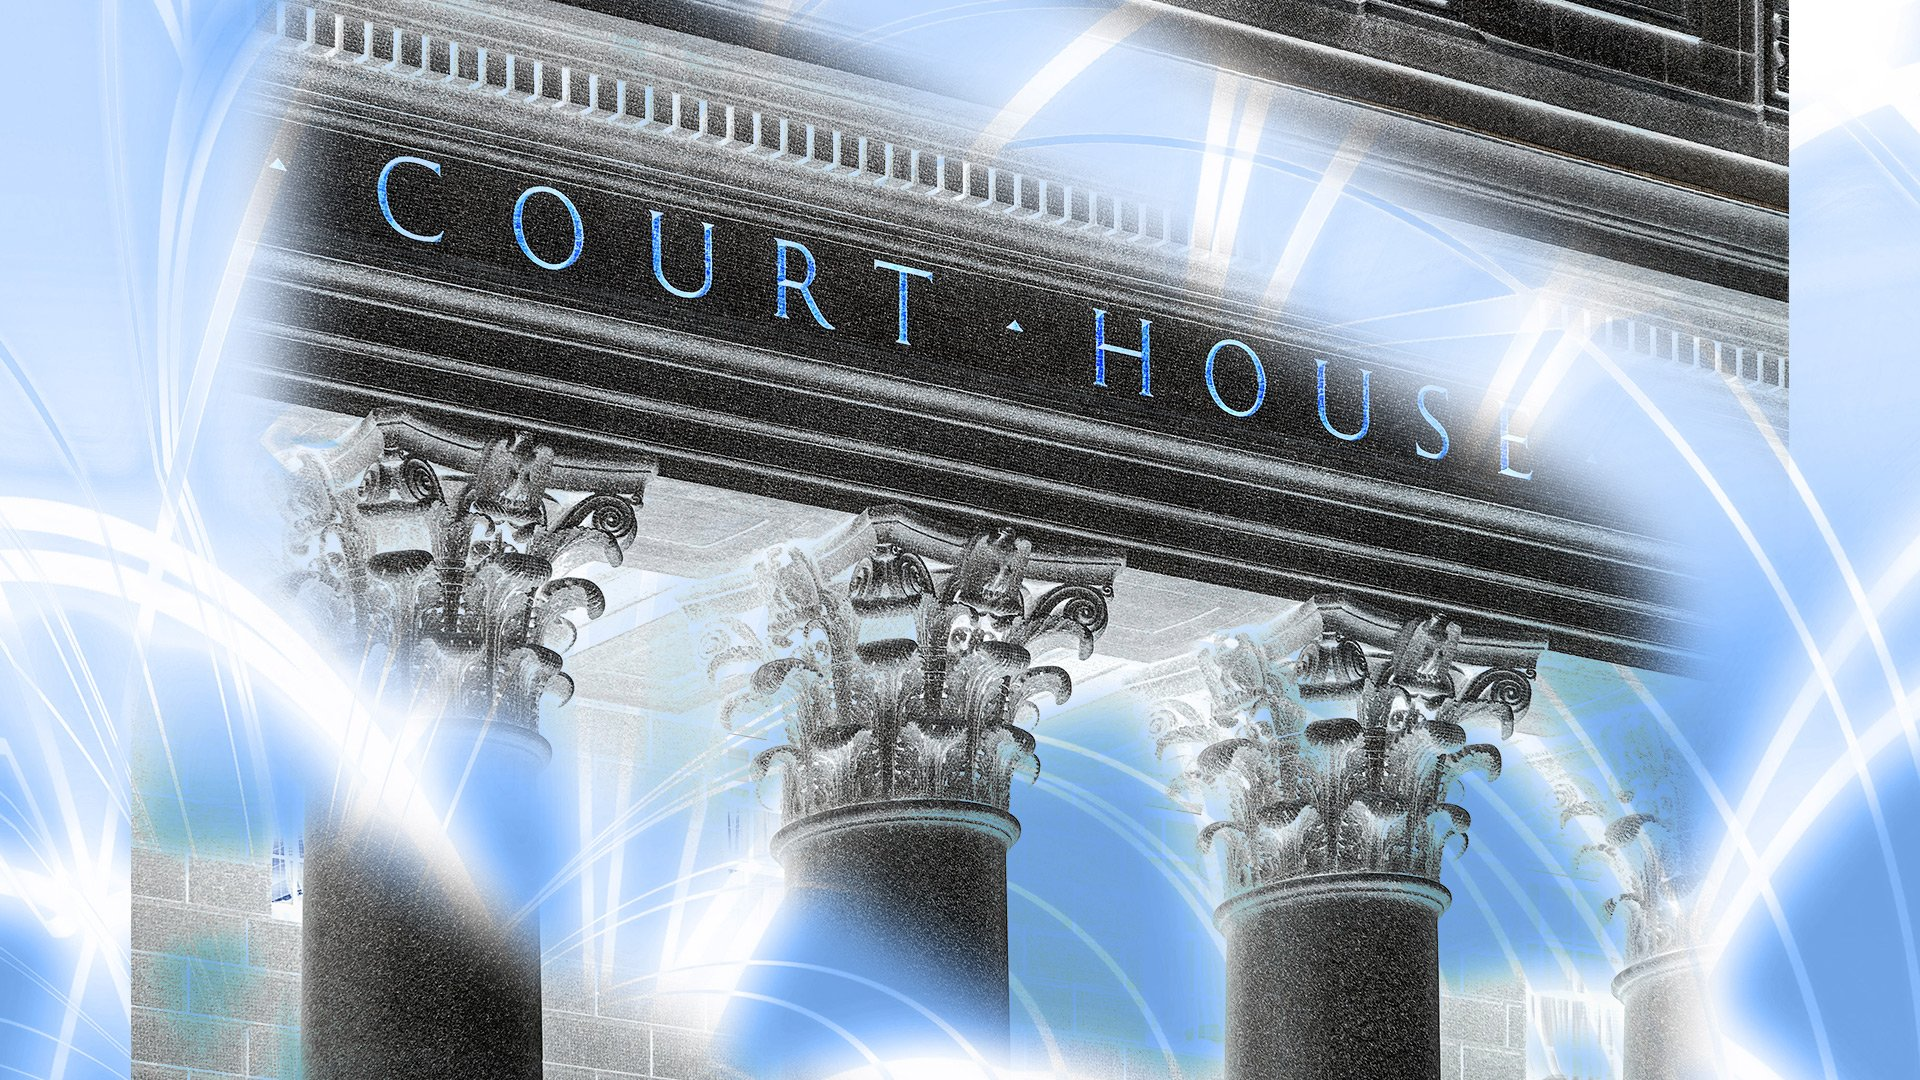 Ethereum researcher Virgil Griffith pleads guilty to sanctions violations